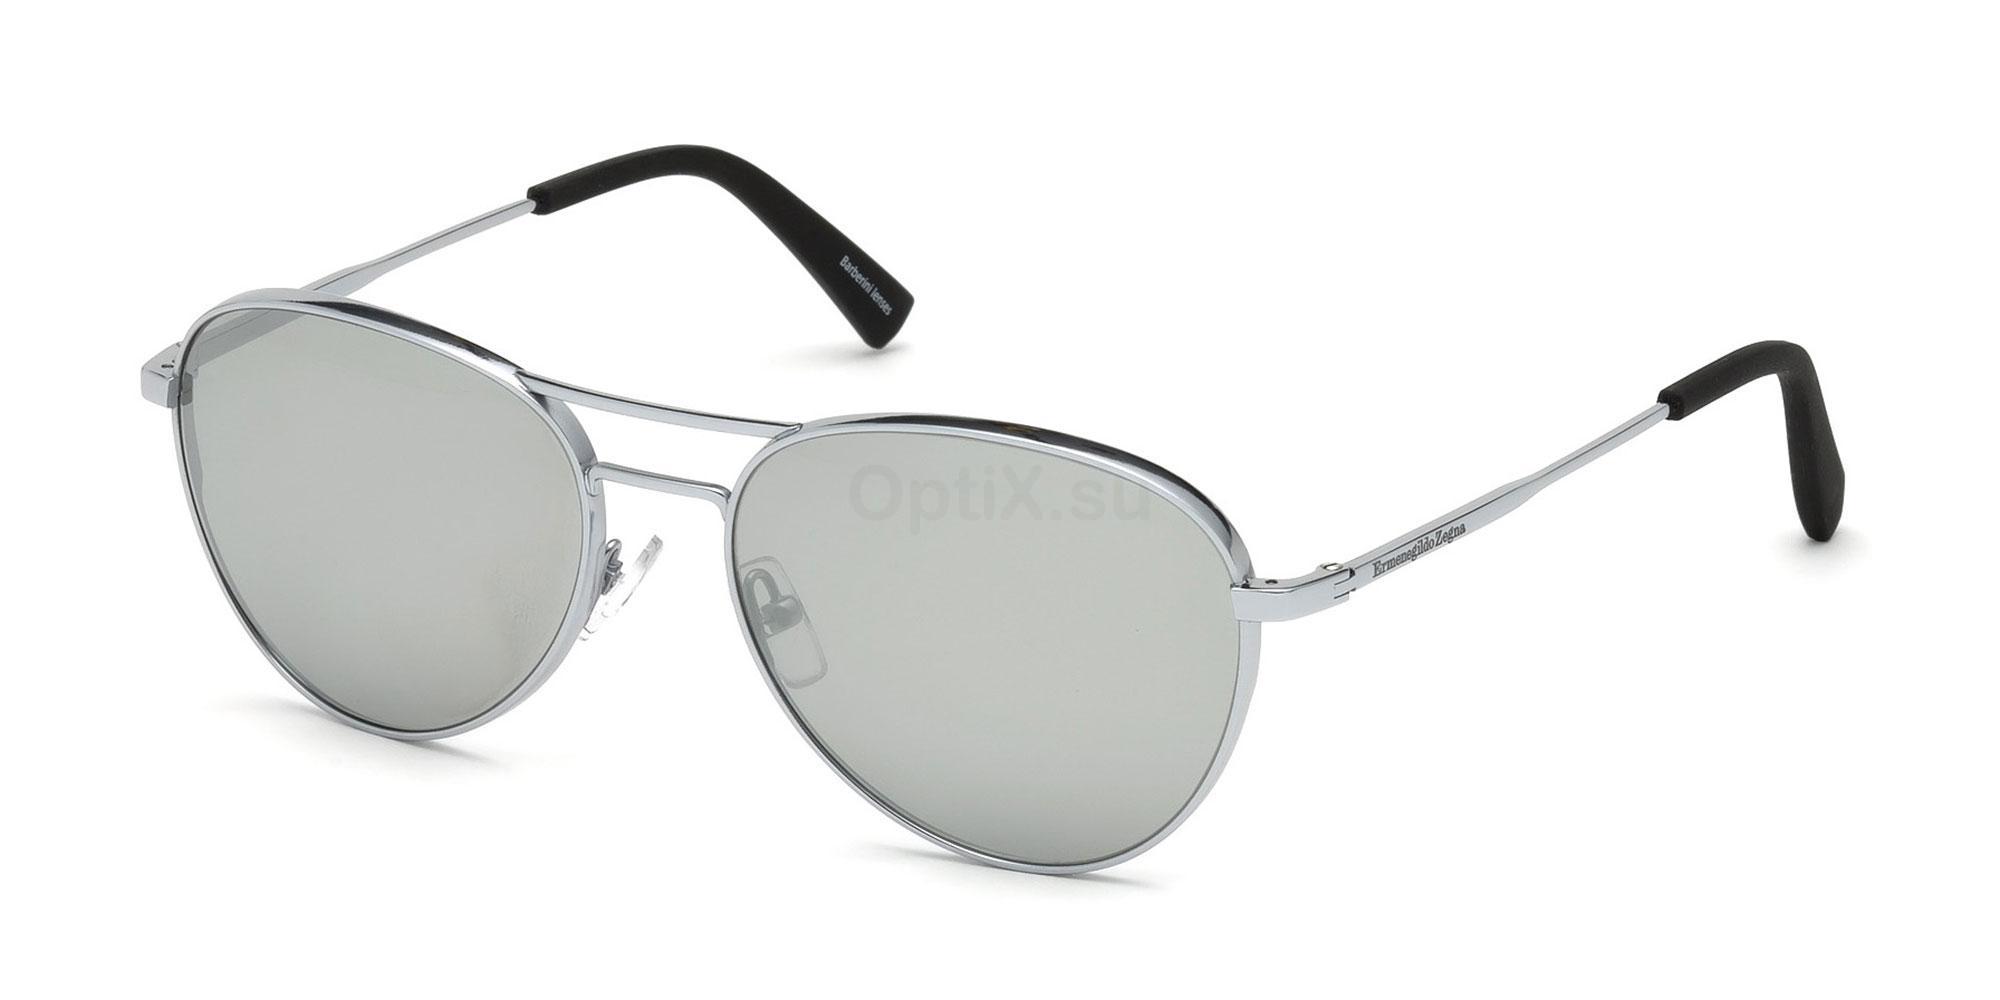 18C EZ0098 Sunglasses, Ermenegildo Zegna